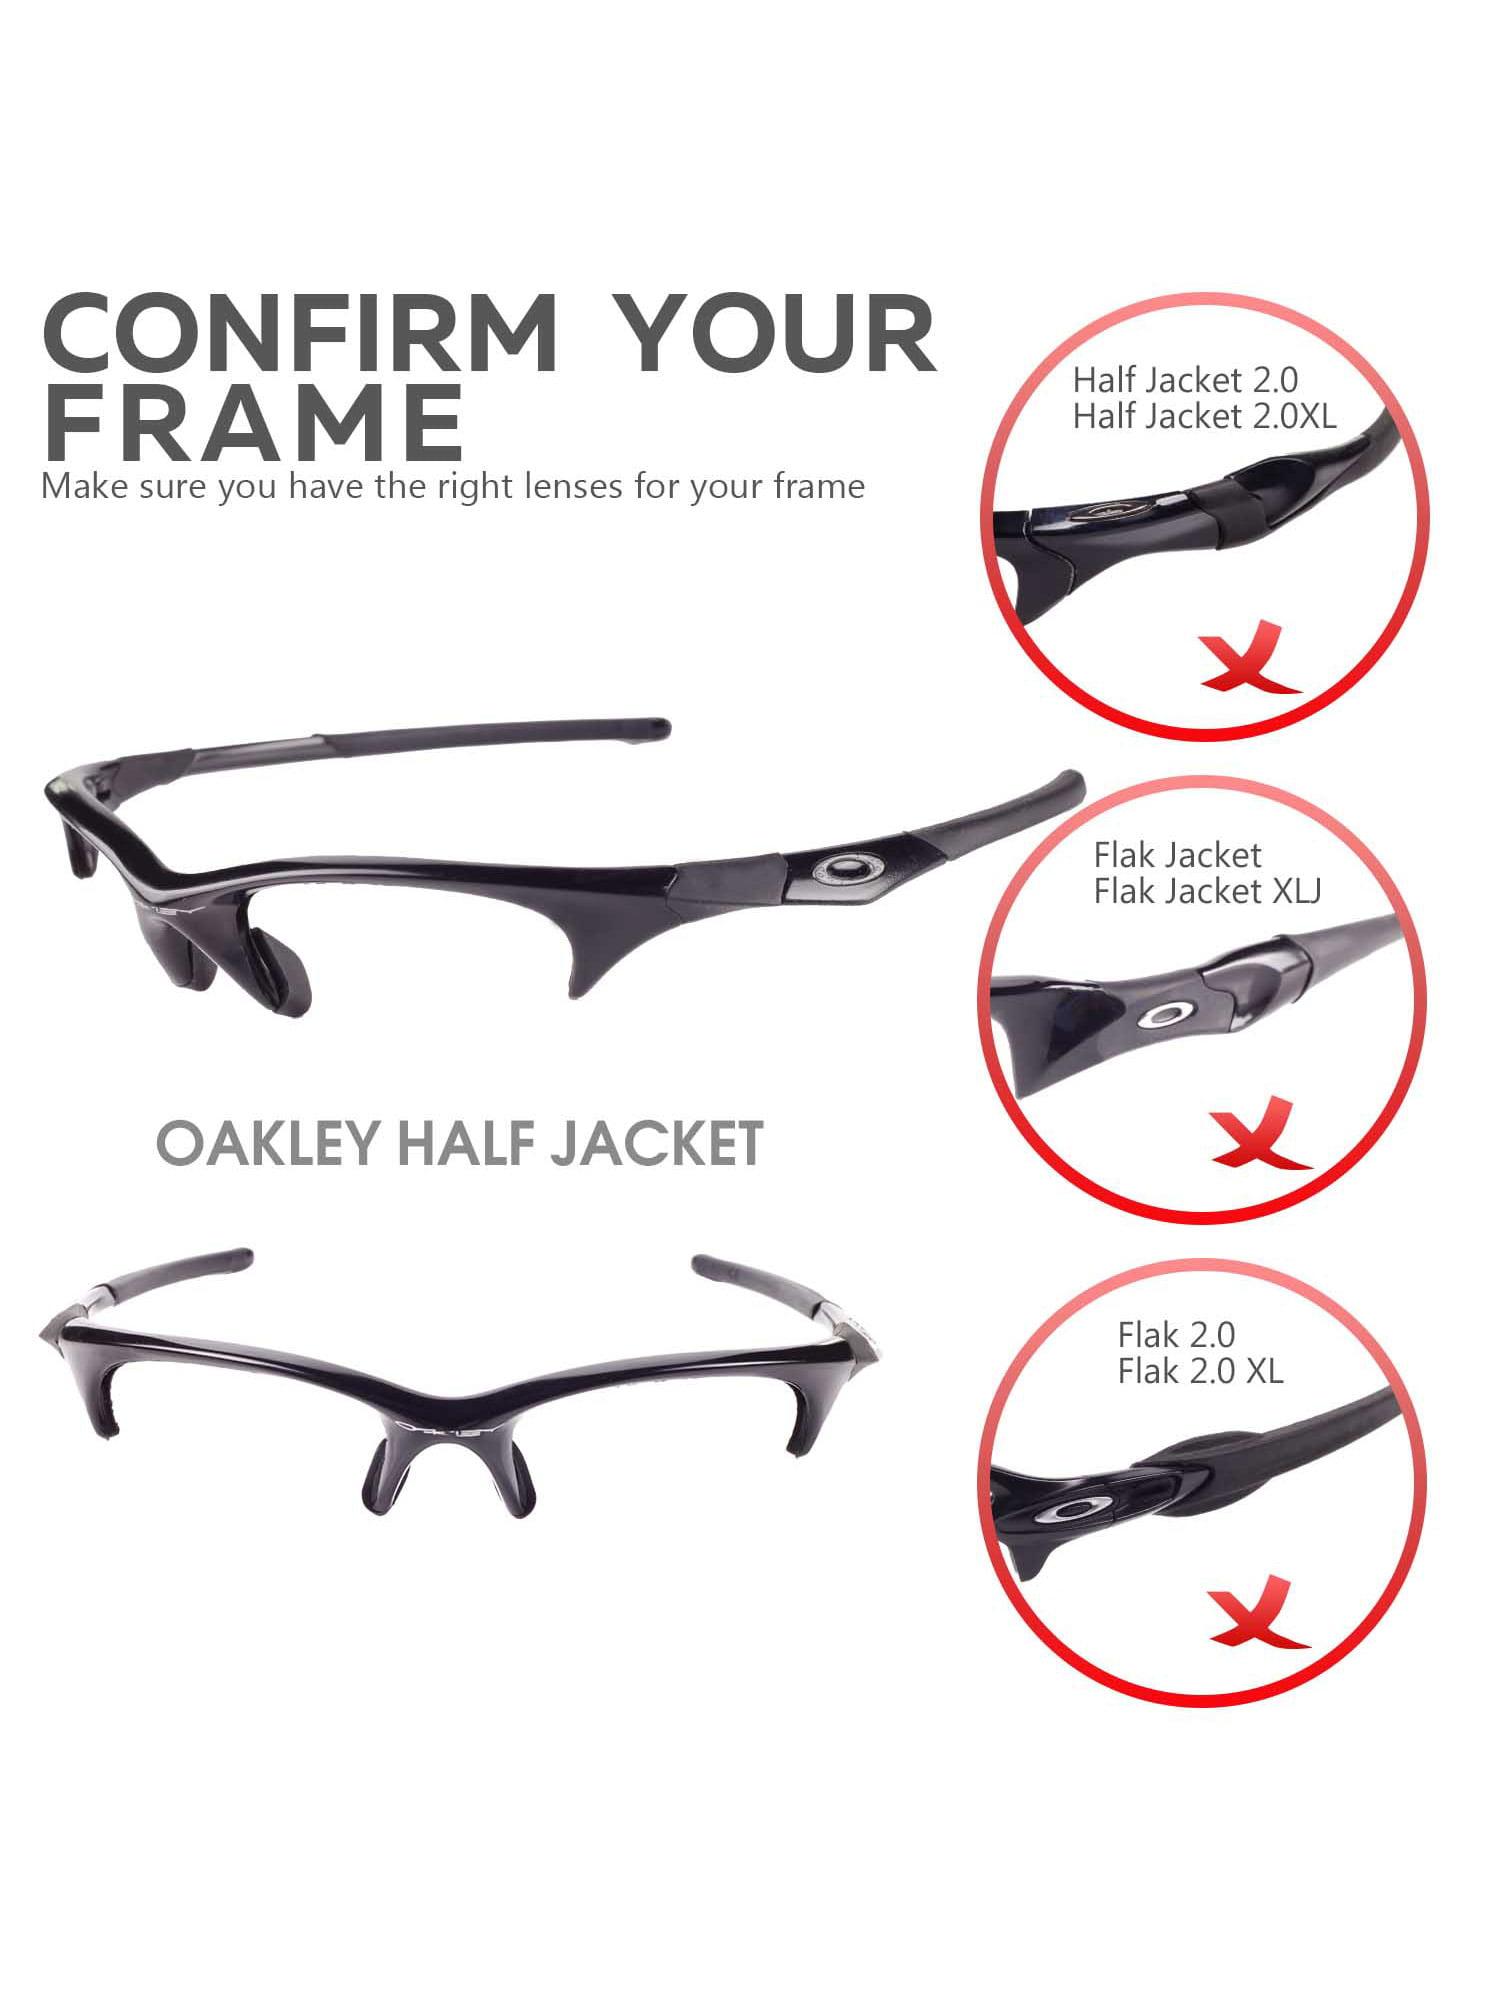 a9eac9ef4e9 Walleva - Walleva Fire Red Polarized Replacement Lenses for Oakley Half  Jacket Sunglasses - Walmart.com